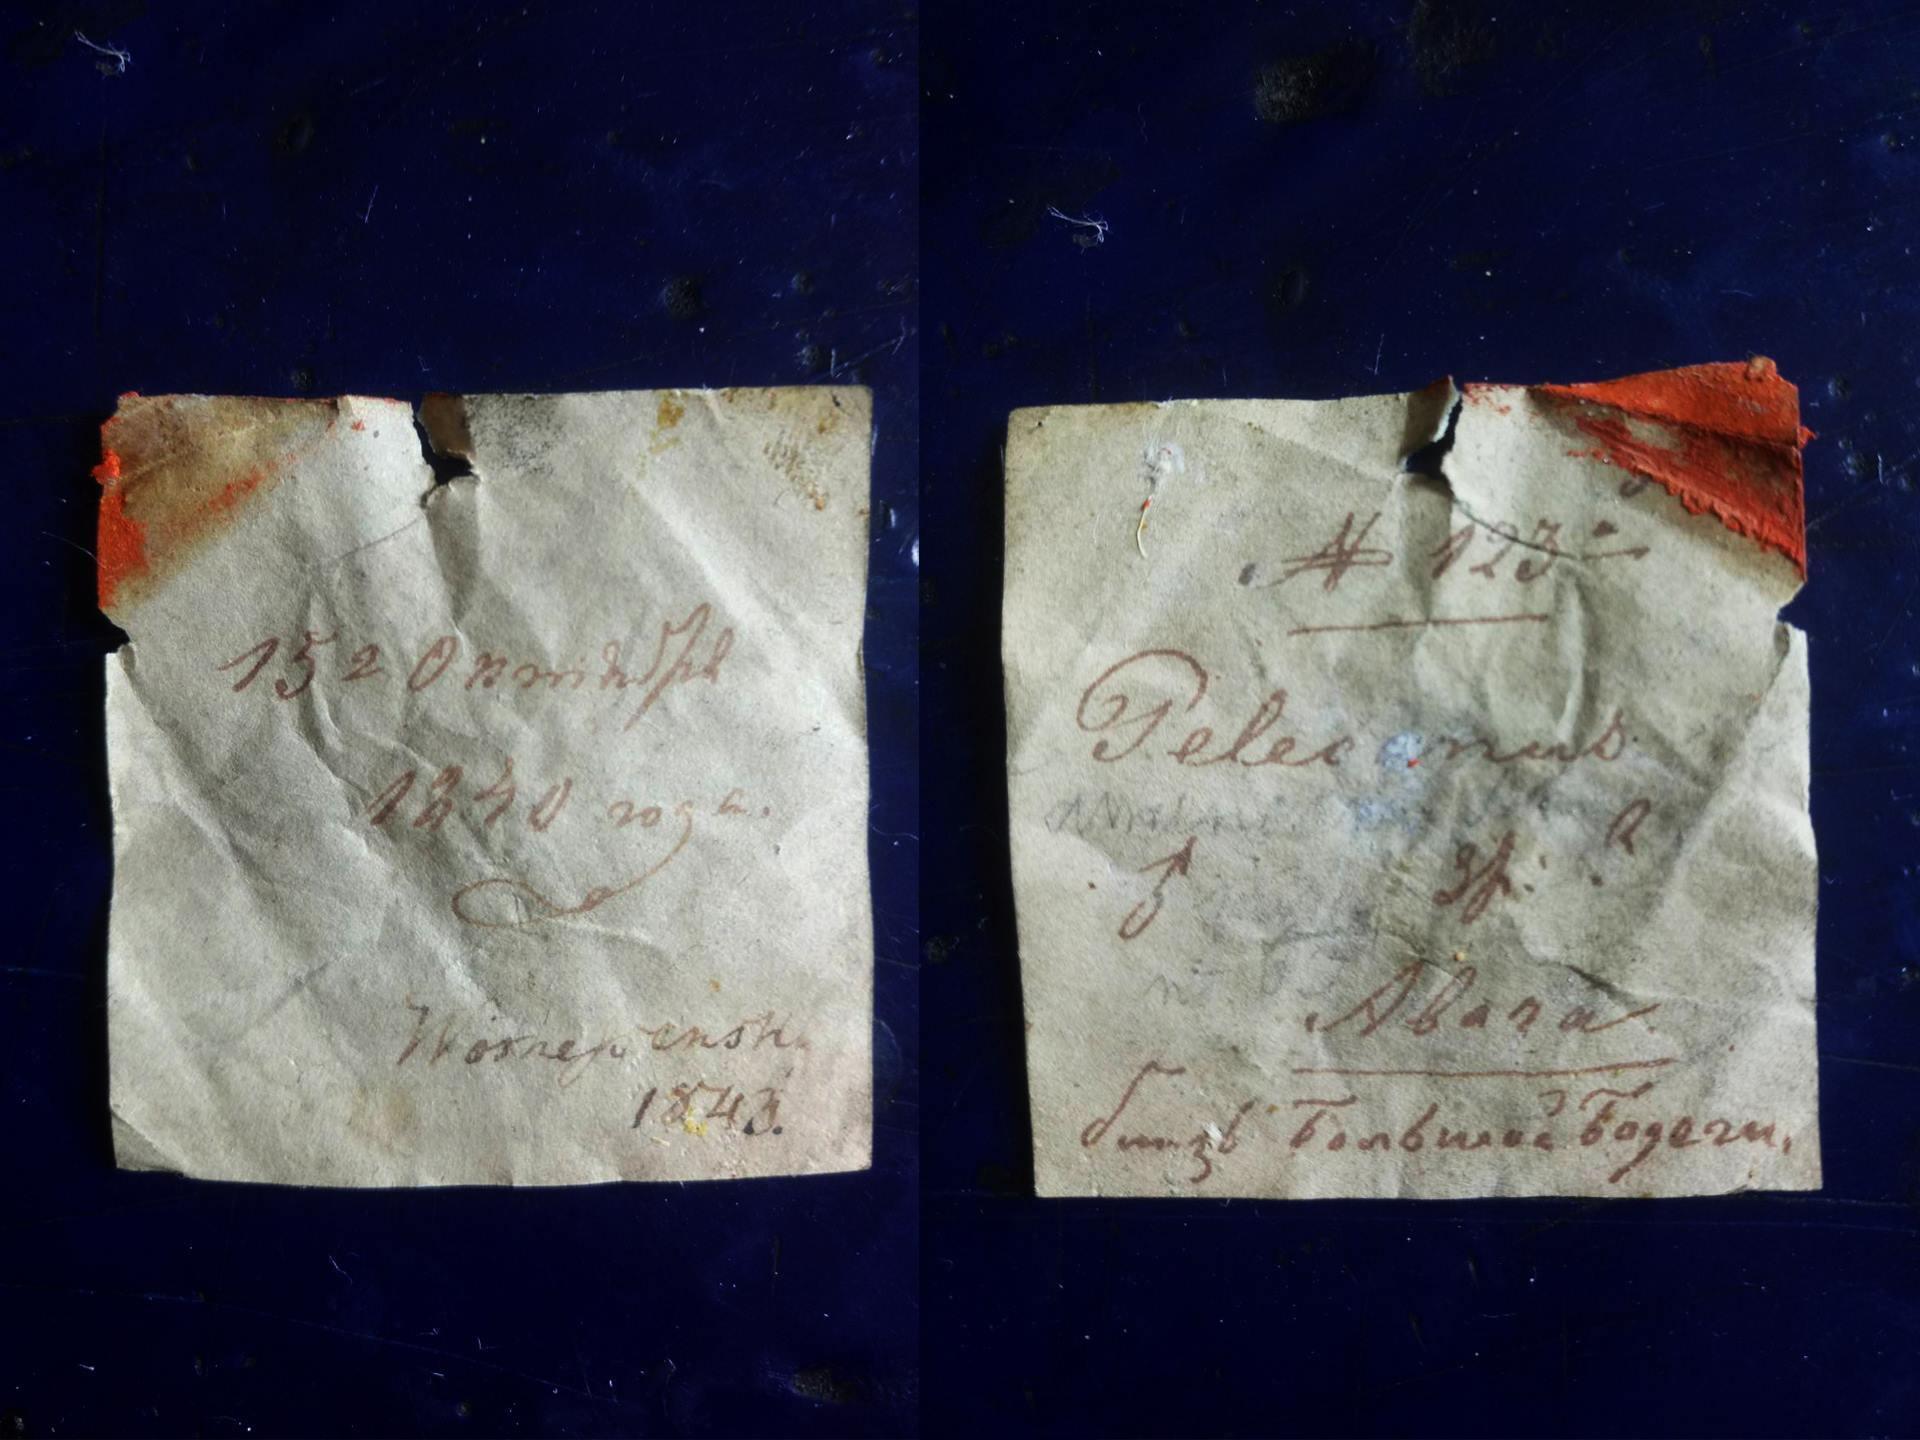 В музеї Києва випадково знайшли старовинну записку